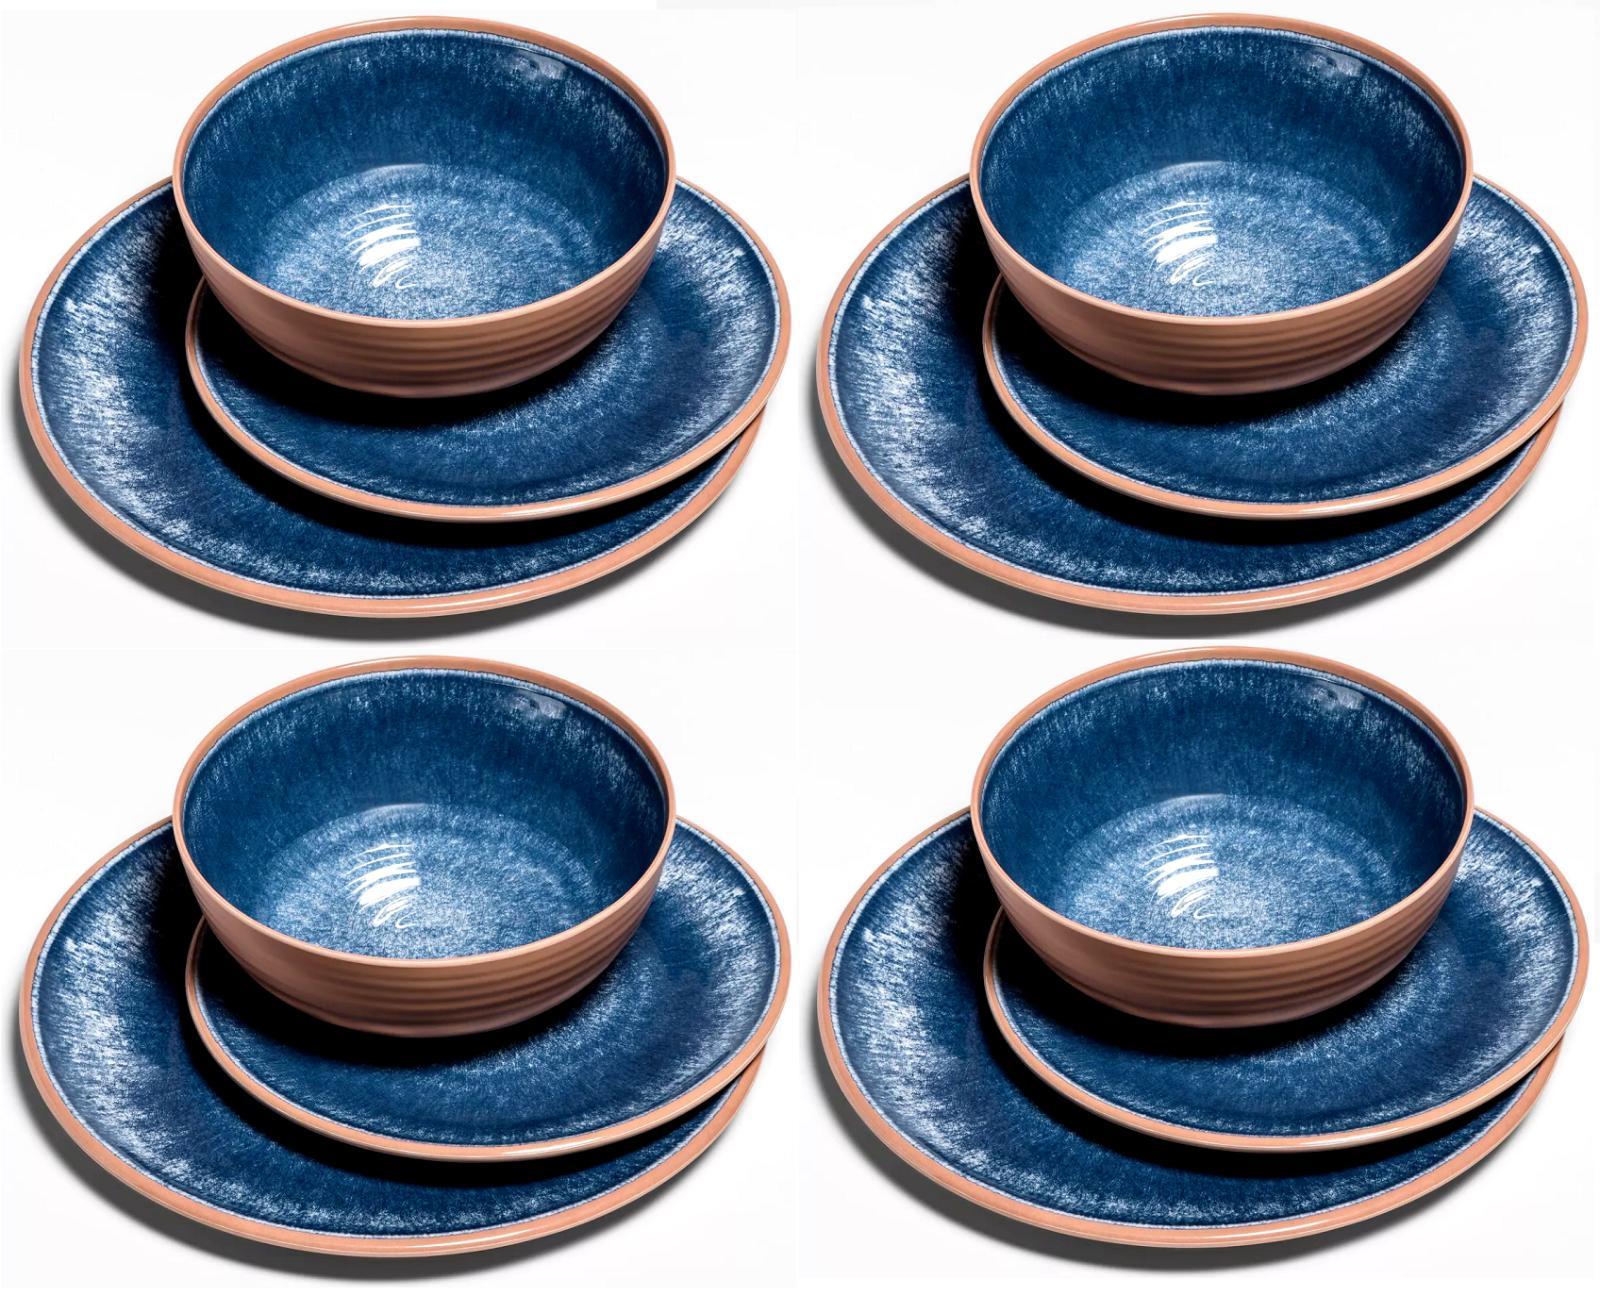 12 piece melamine dinnerware set blue clay